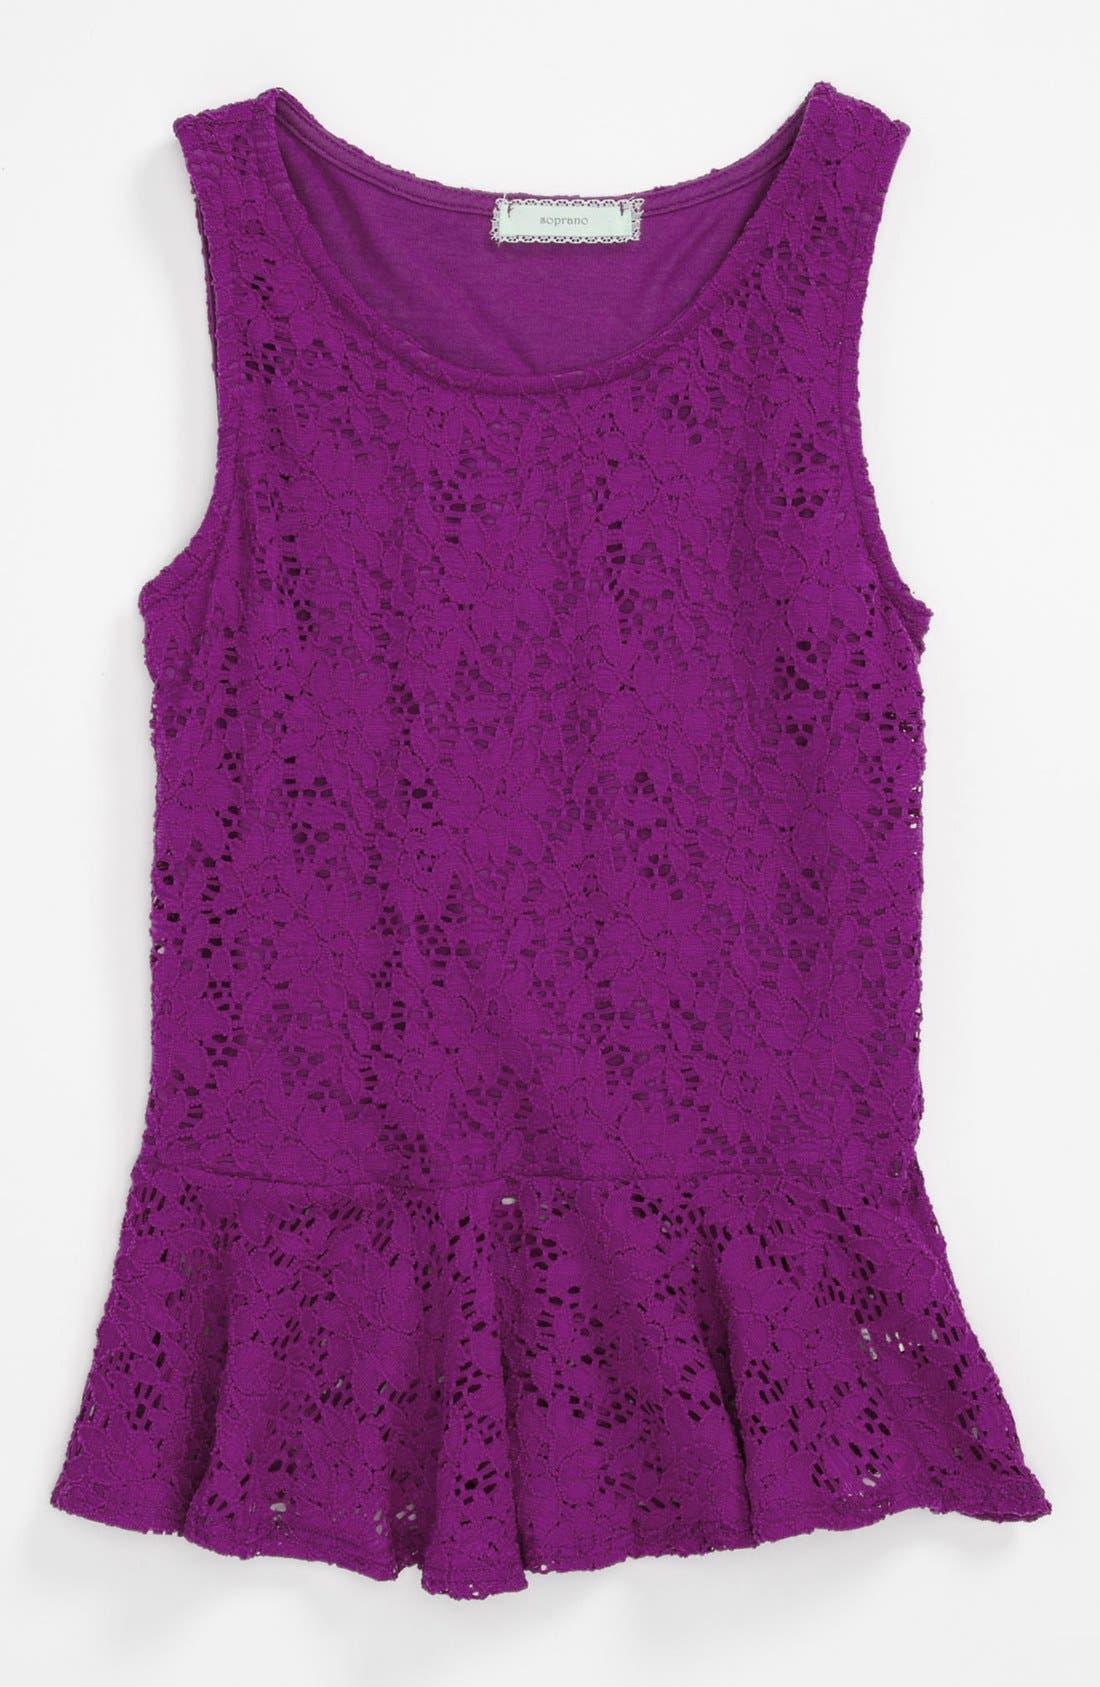 Main Image - Soprano Lace Peplum Shirt (Big Girls)